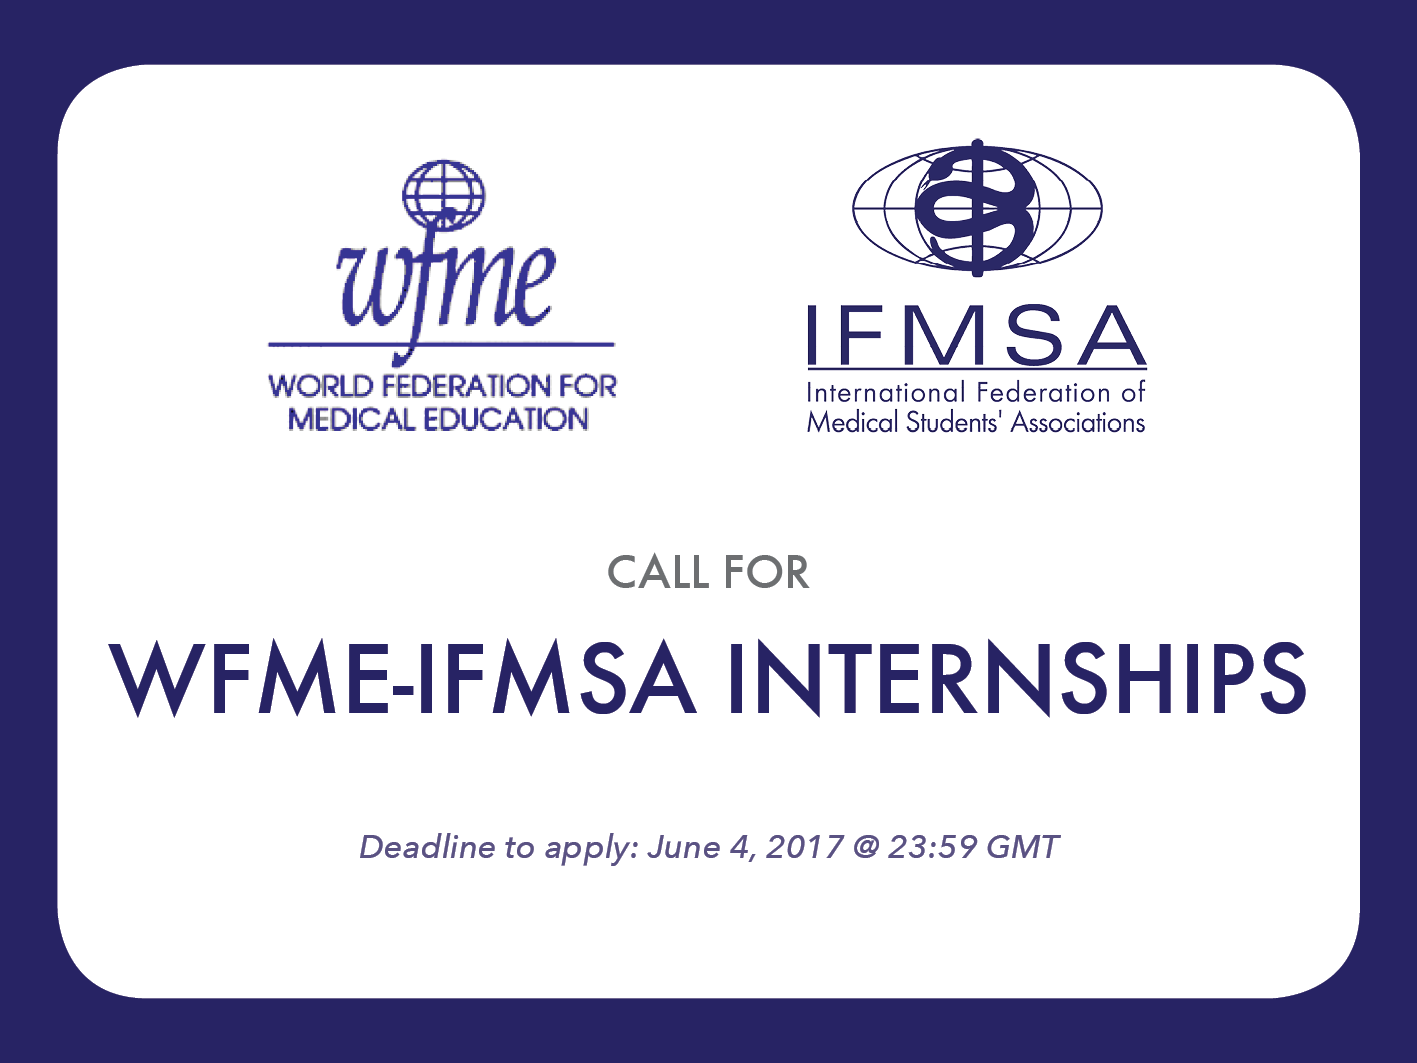 Call for WFME-IFMSA Internships